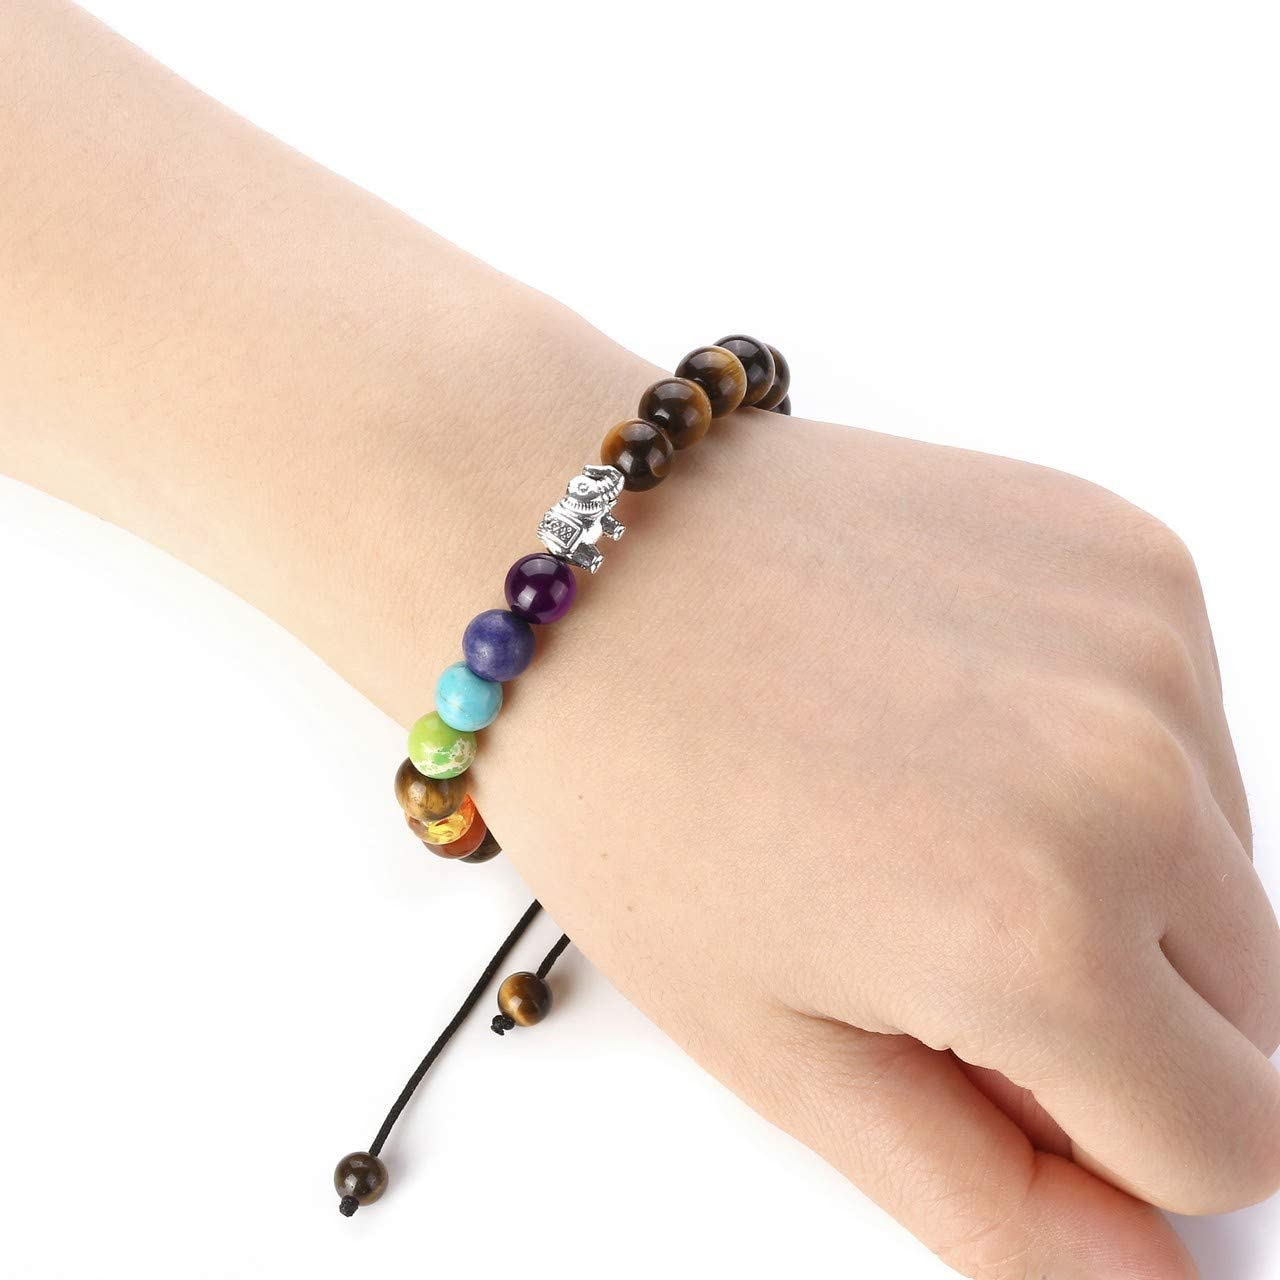 JOVIVI 7 Chakra Amethyst Crystal Bracelet Women Elephant Lucky Charm Purple Gemstone Reiki Healing Balancing Yoga Energy Stone Beads Bracelet